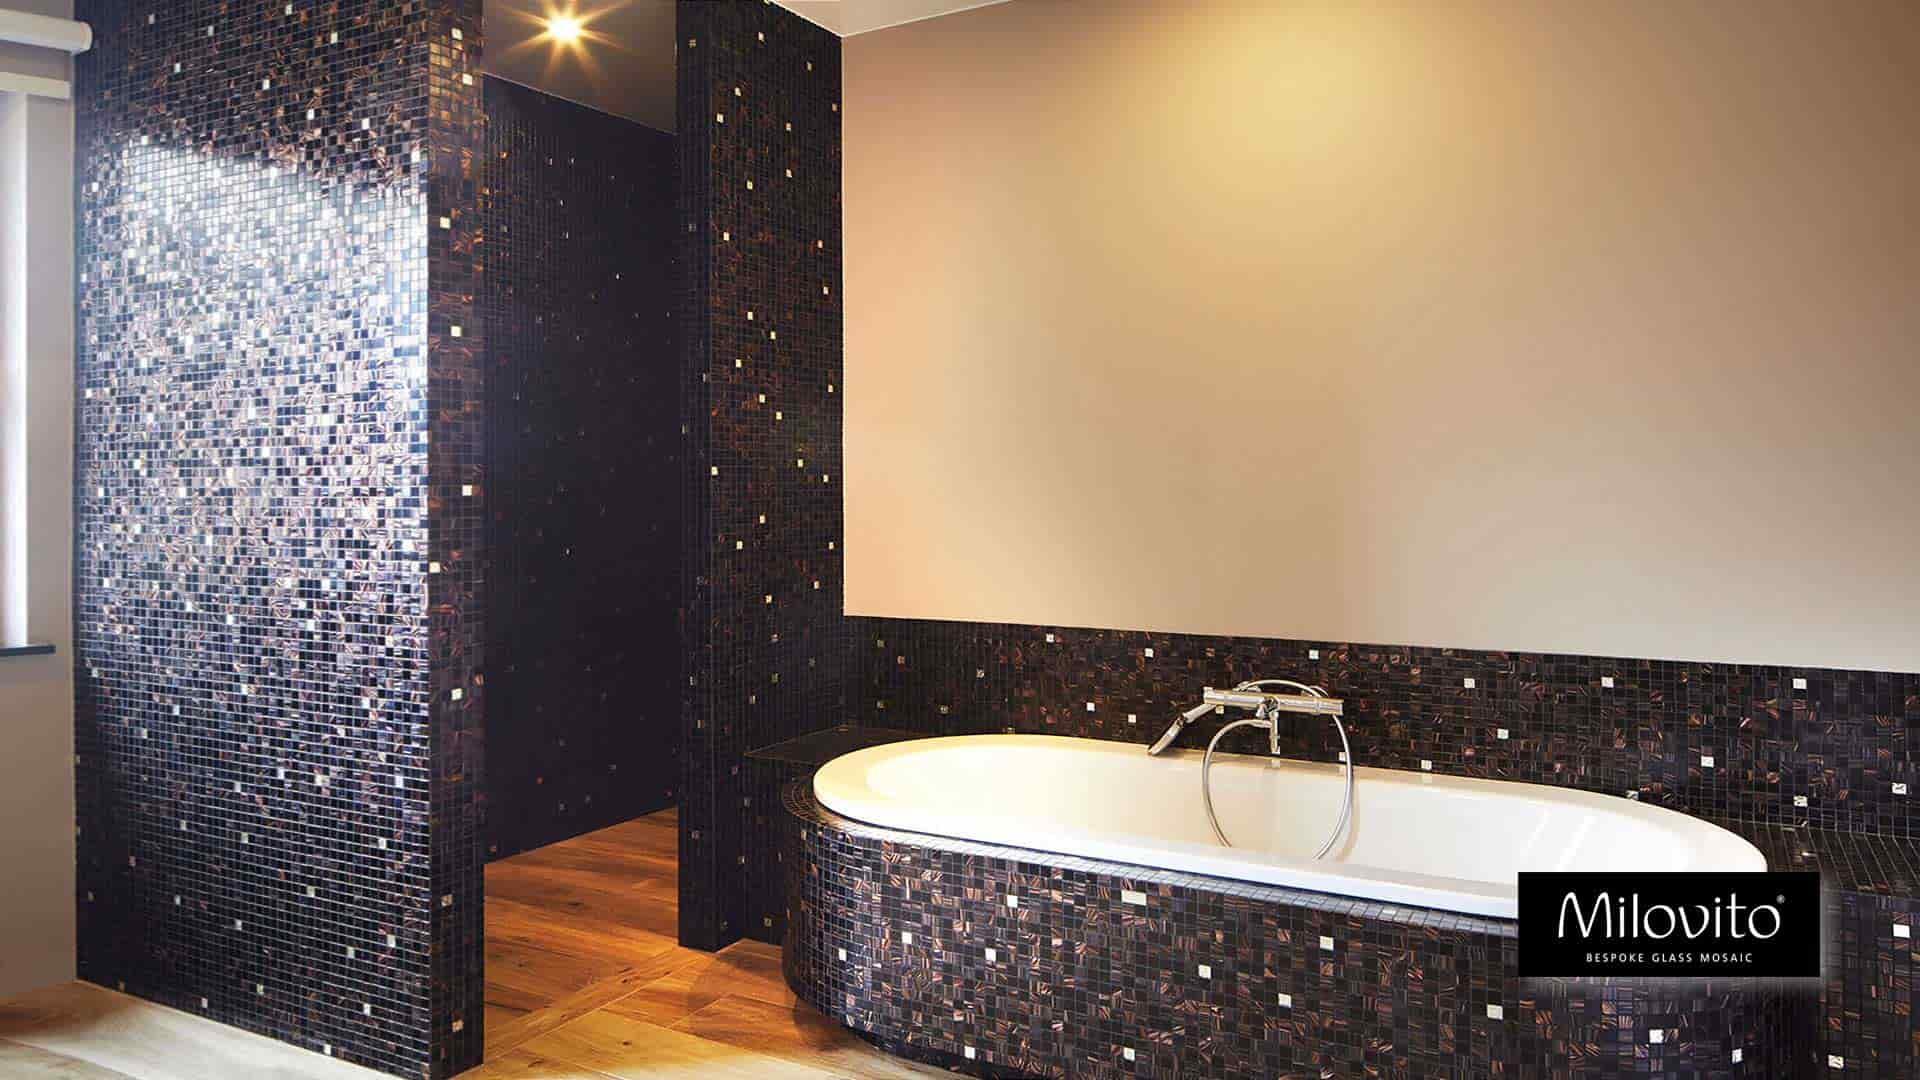 Badkamer Van Mozaiek : Unieke badkamers met bespoke glasmozaïek design productie én